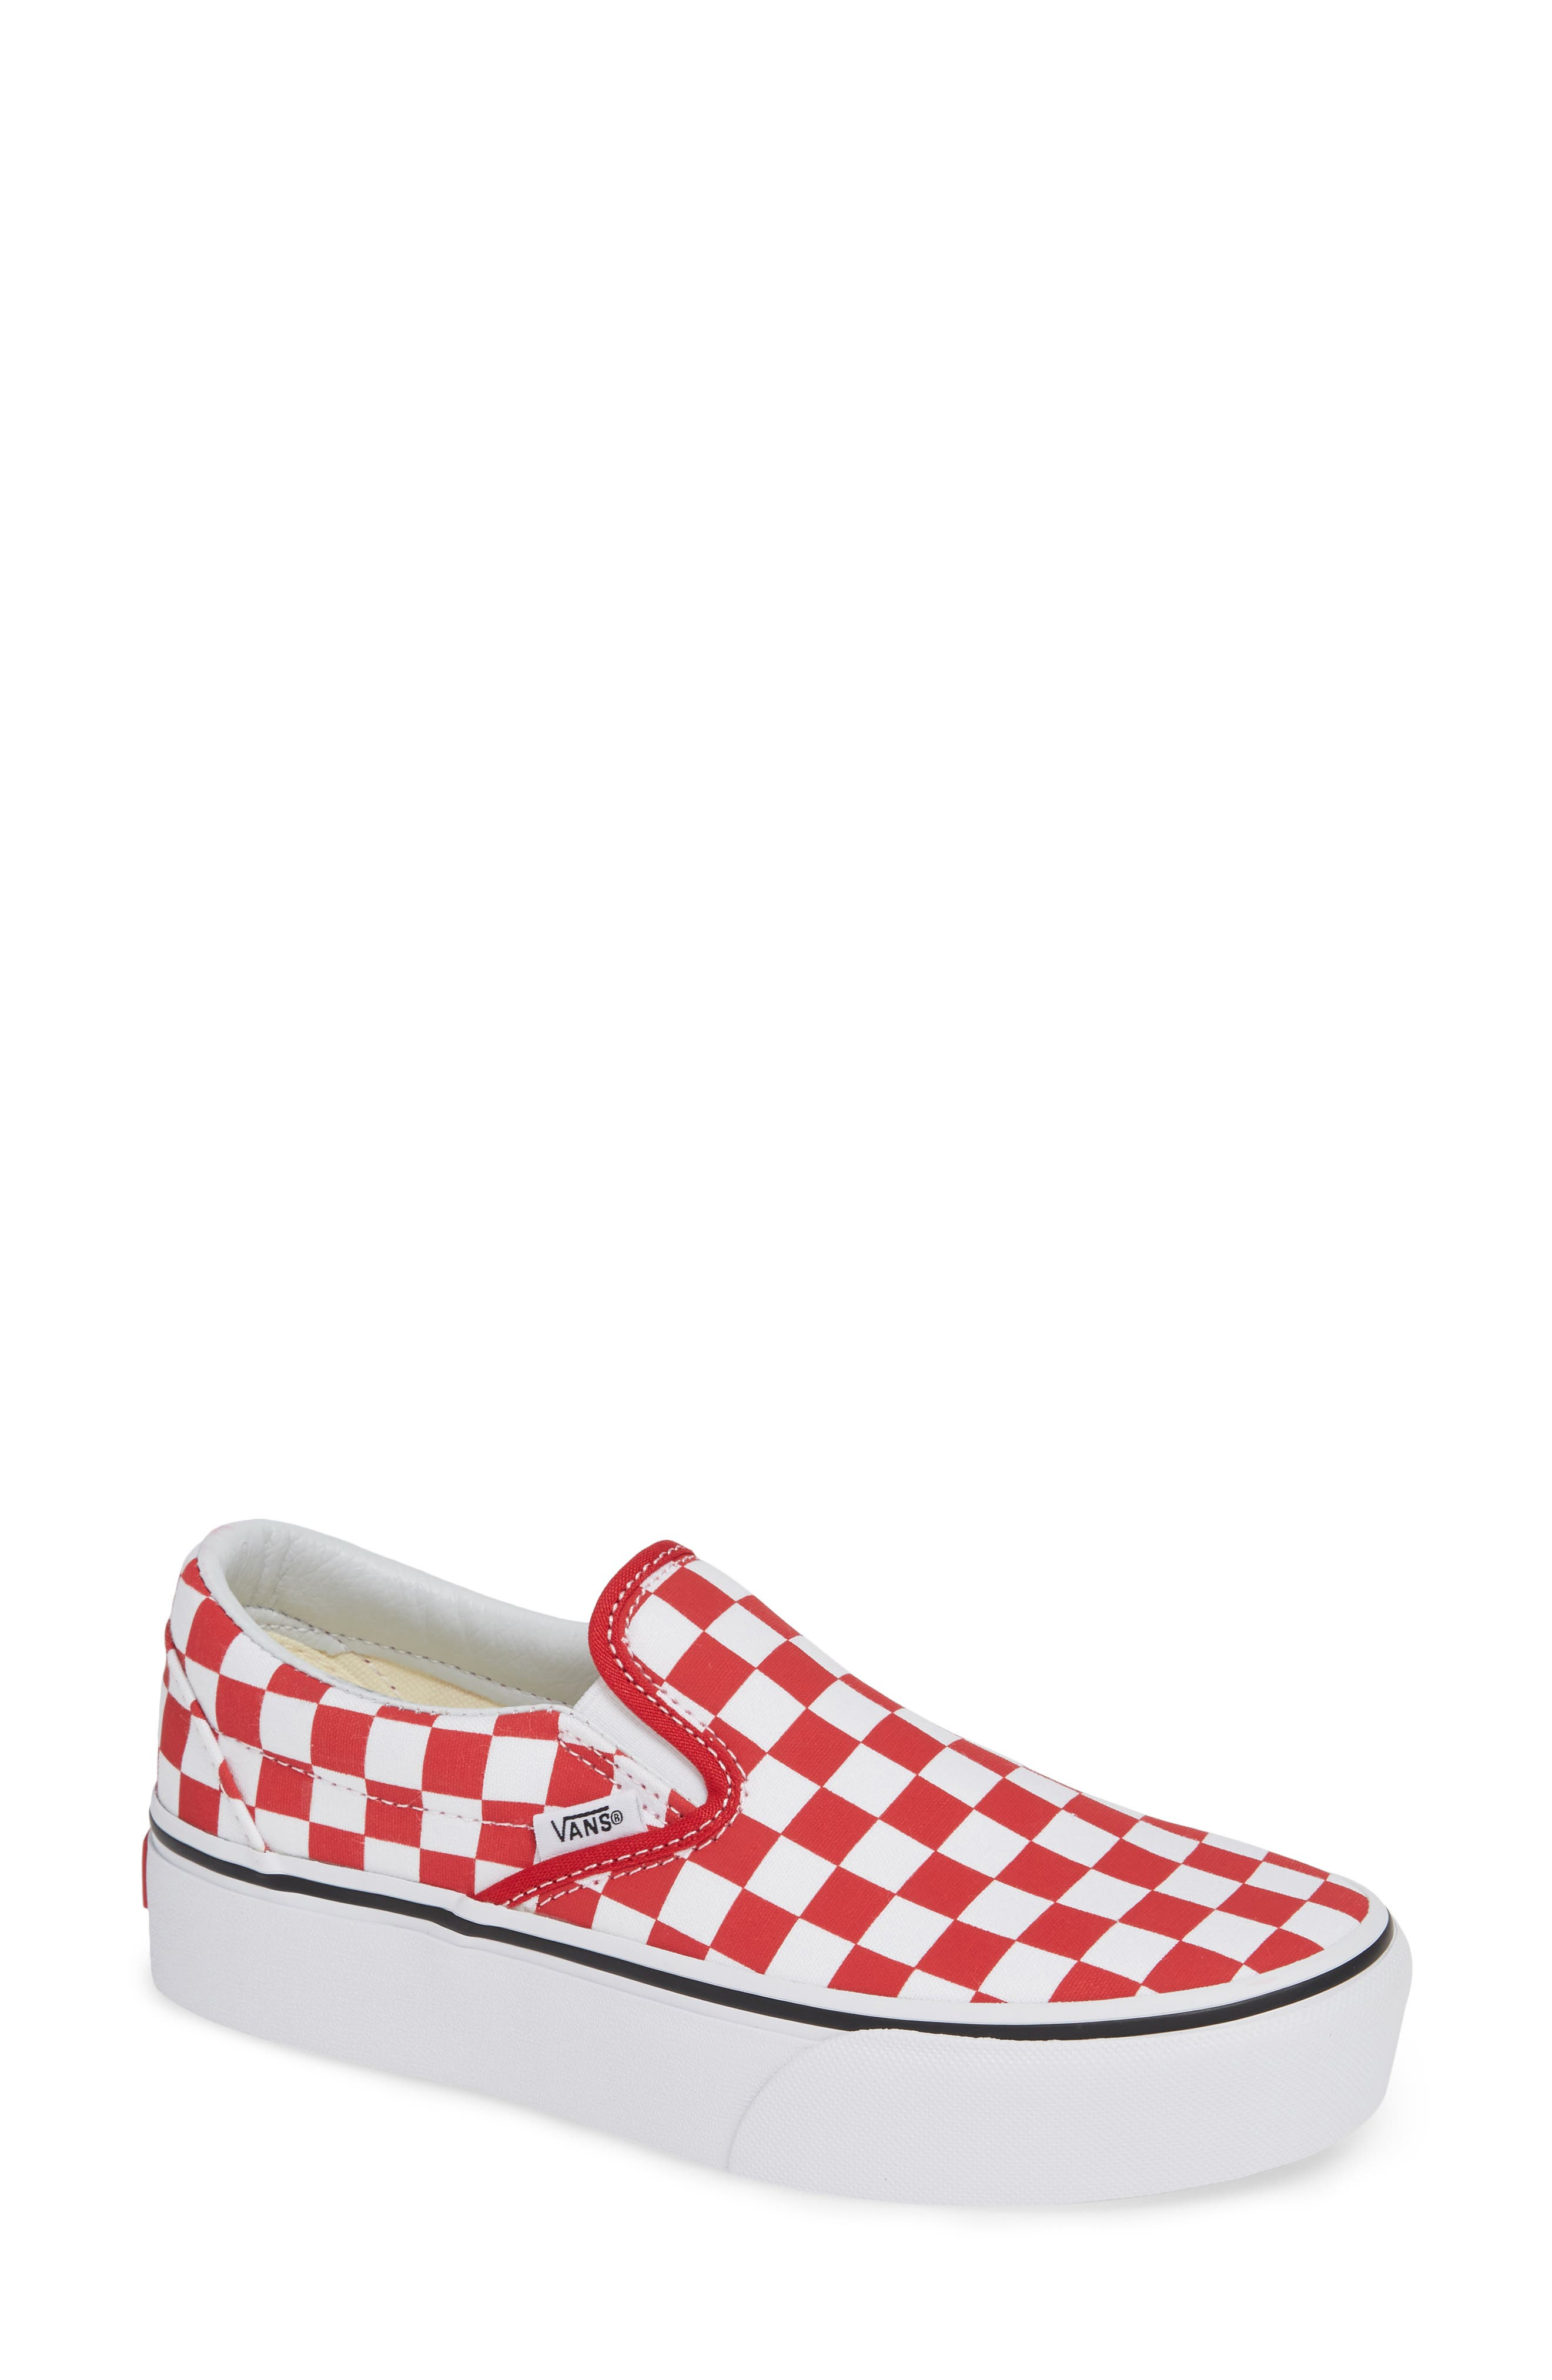 Platform Slip-On Sneaker,                         Main,                         color, RACING RED/ TRUE WHITE